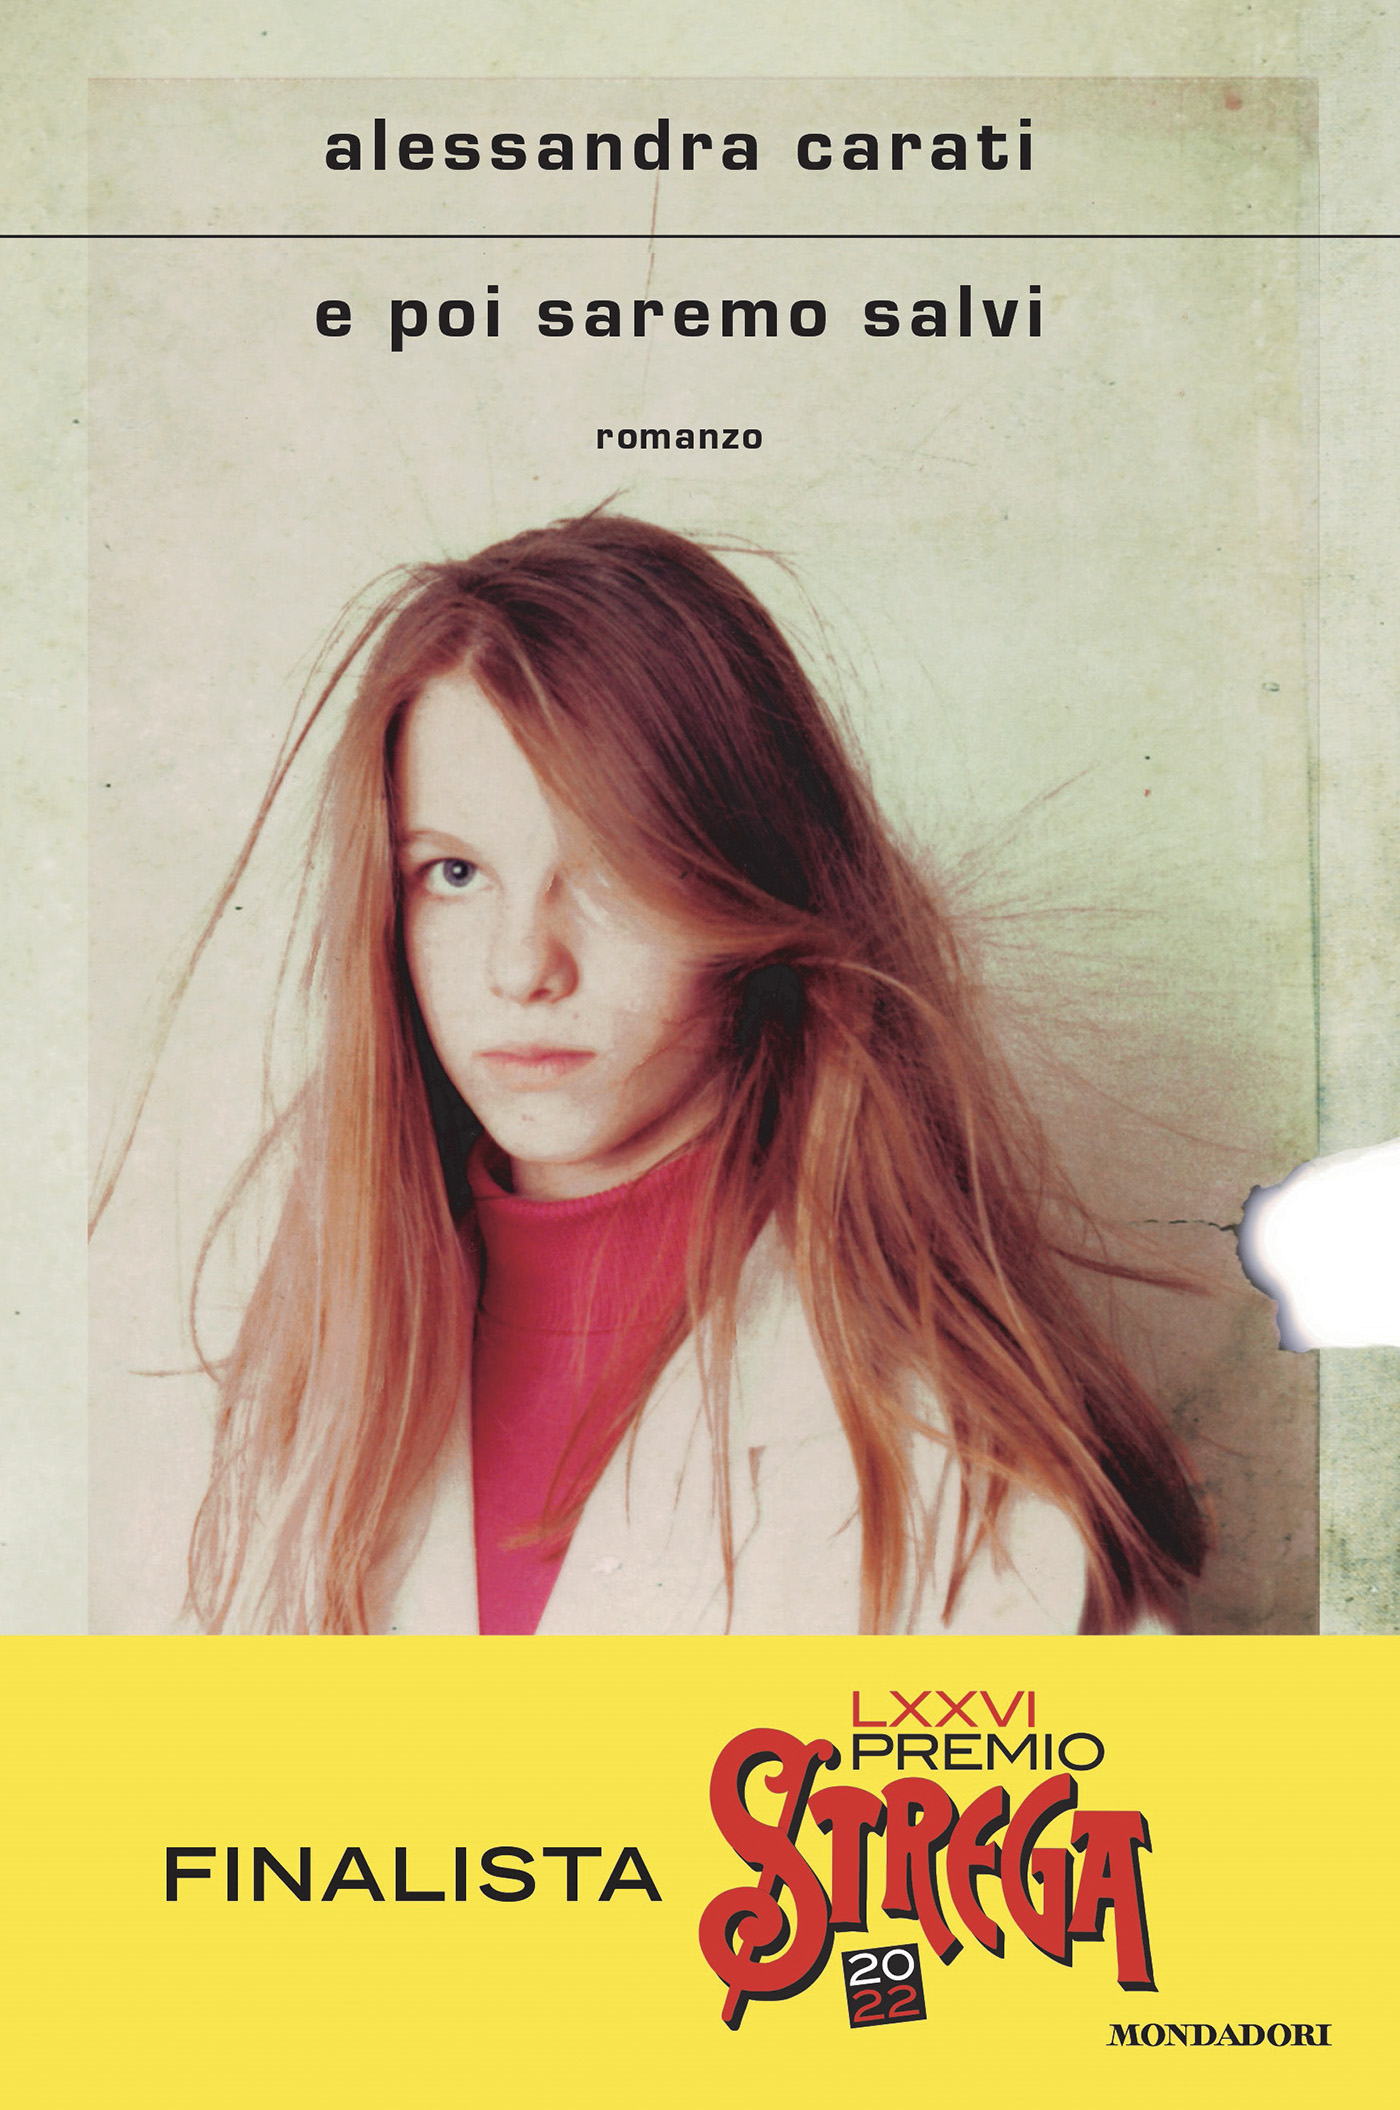 E poi saremo salvi - Alessandra Carati | Libri Mondadori